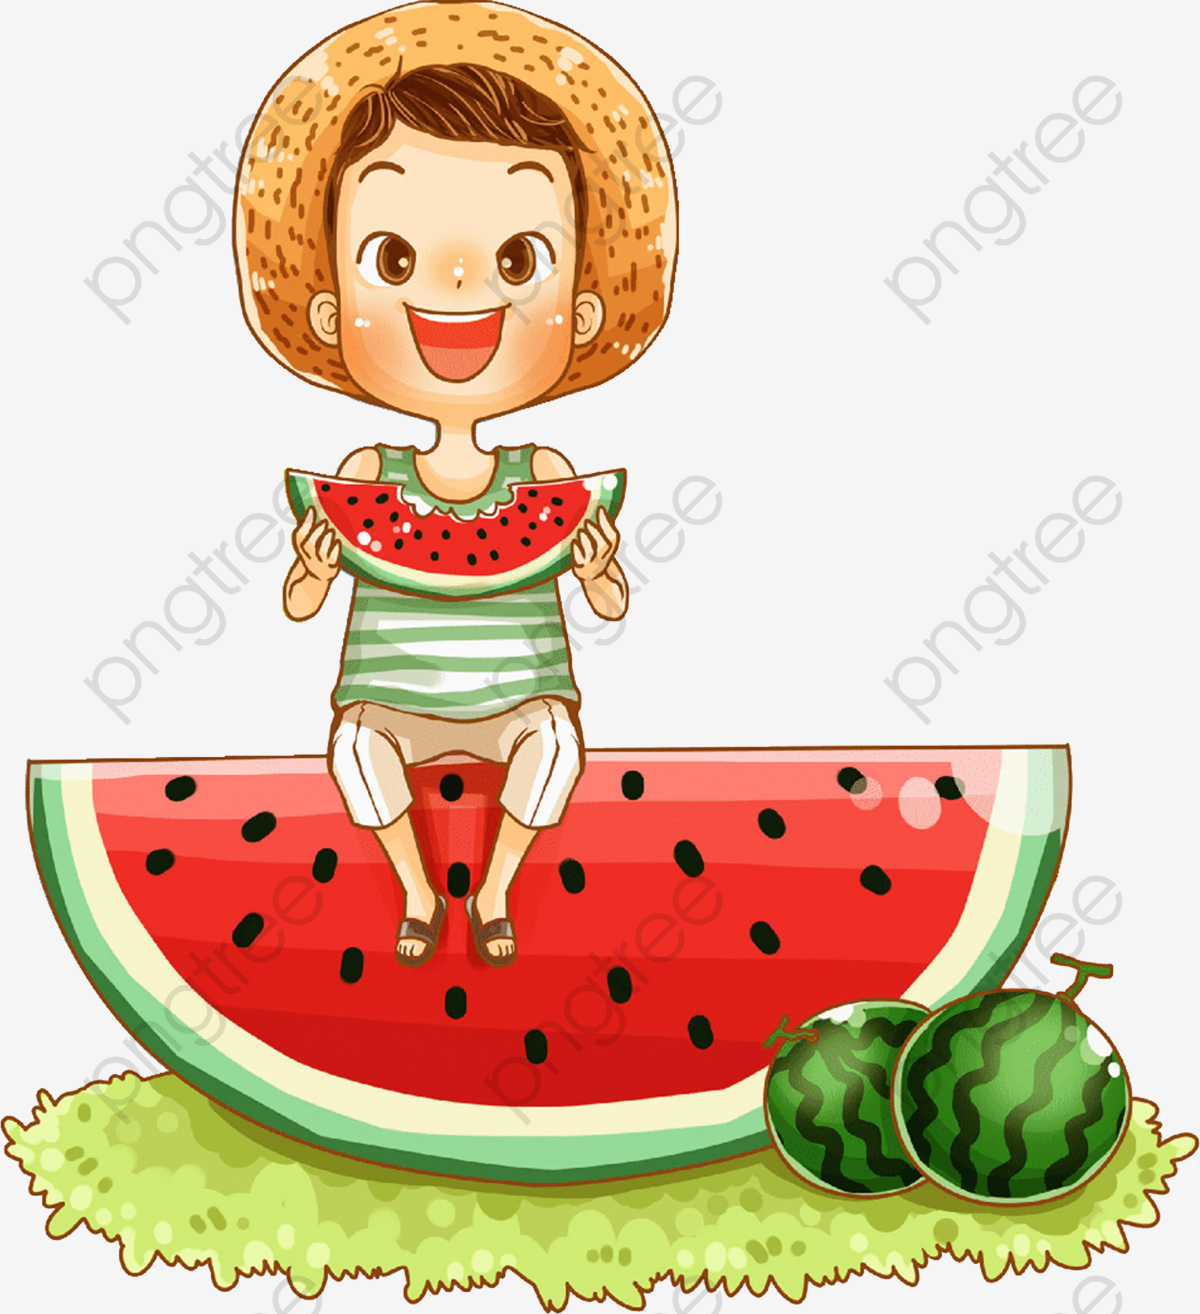 Cartoon Boy Sitting On Watermelon Eating Watermelon Illustration.